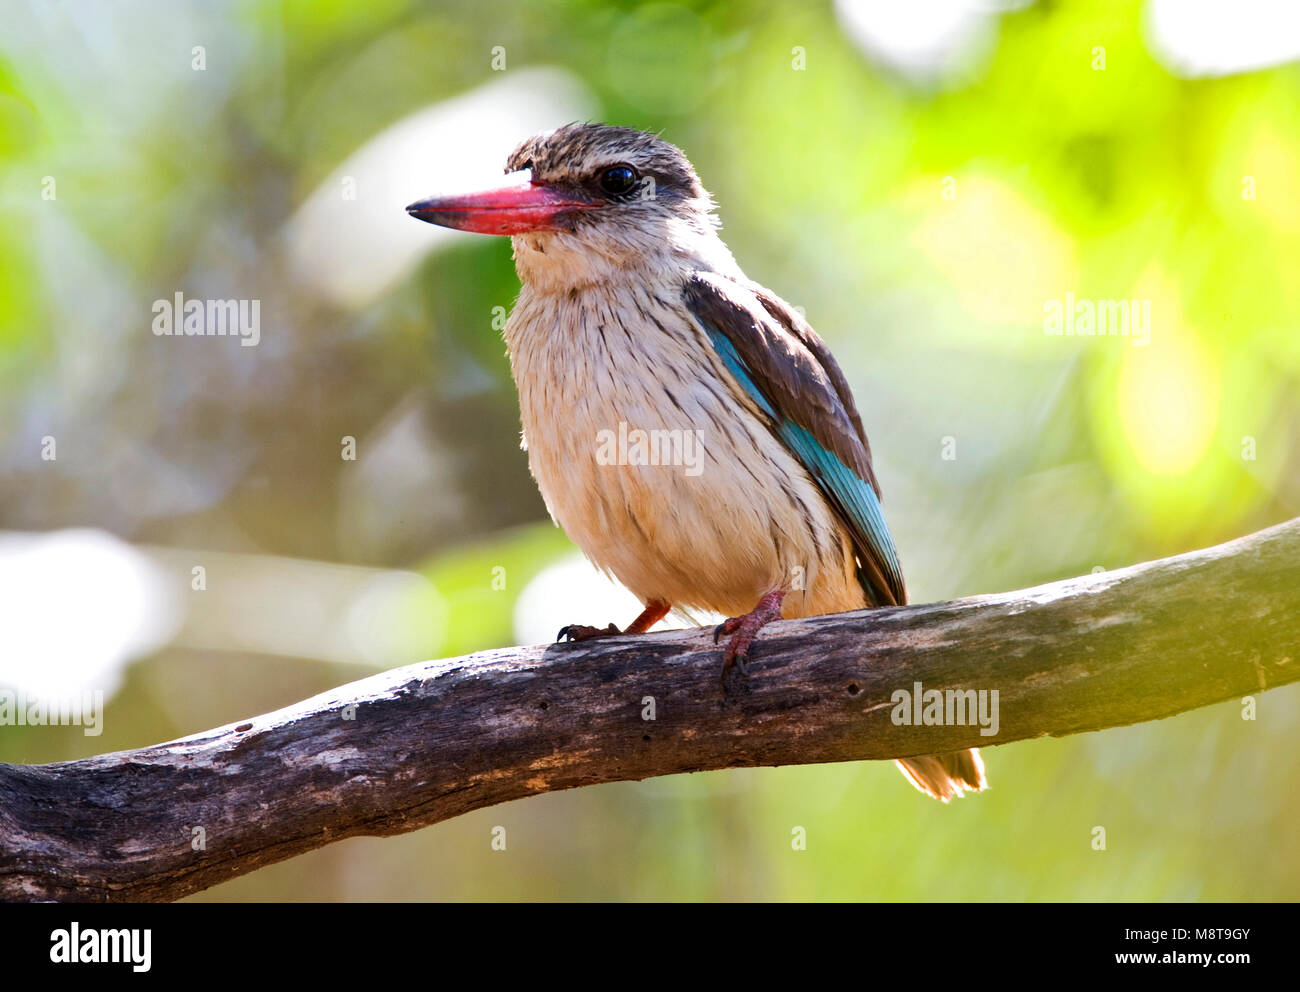 Bruinkapijsvogel, Brown-hooded Kingfisher, Halcyon albiventris - Stock Image